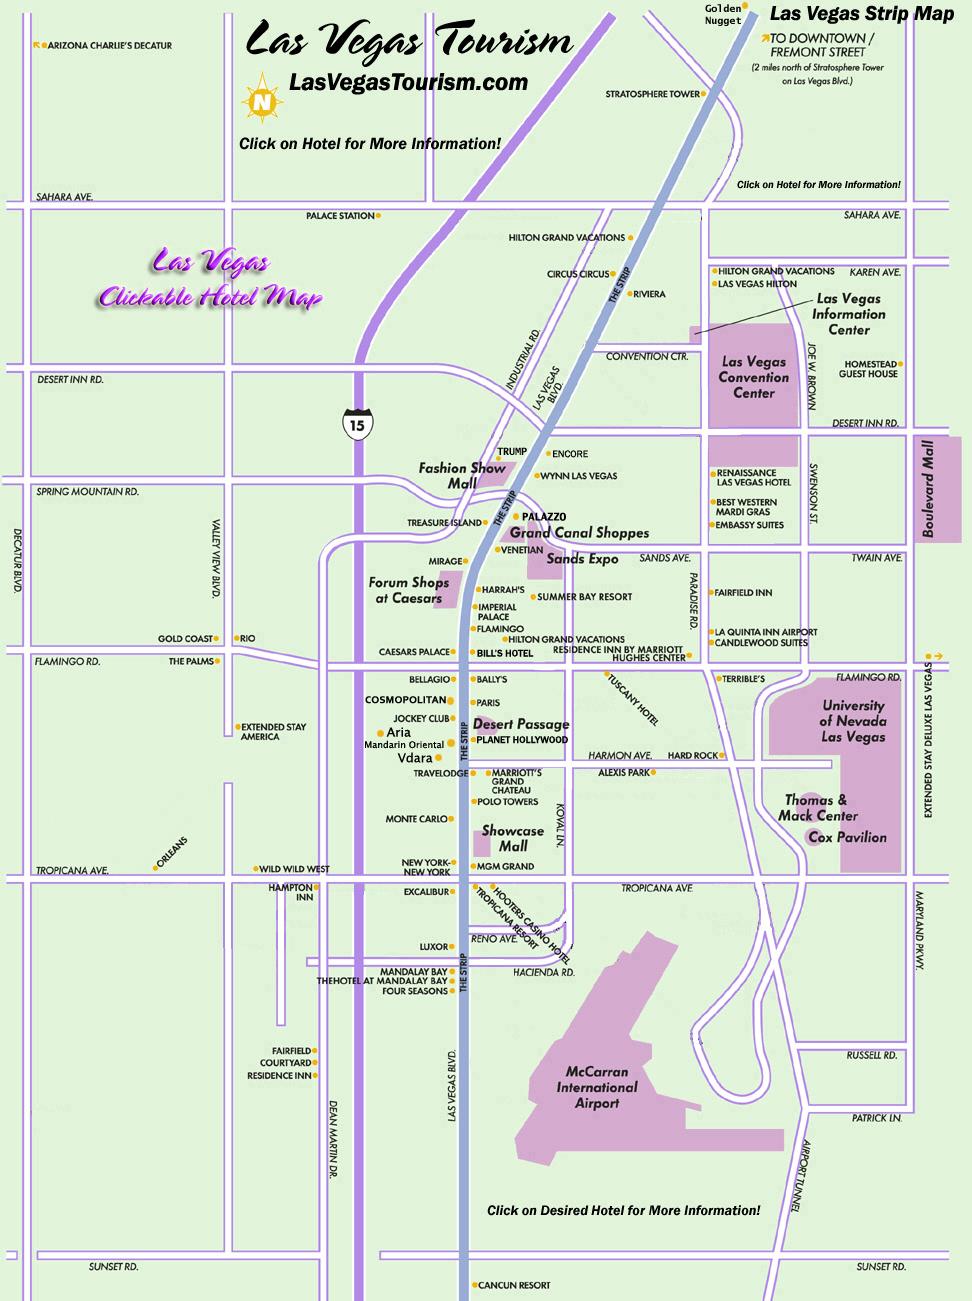 Las Vegas Map, Official Site - Las Vegas Strip Map - Printable Las Vegas Street Maps